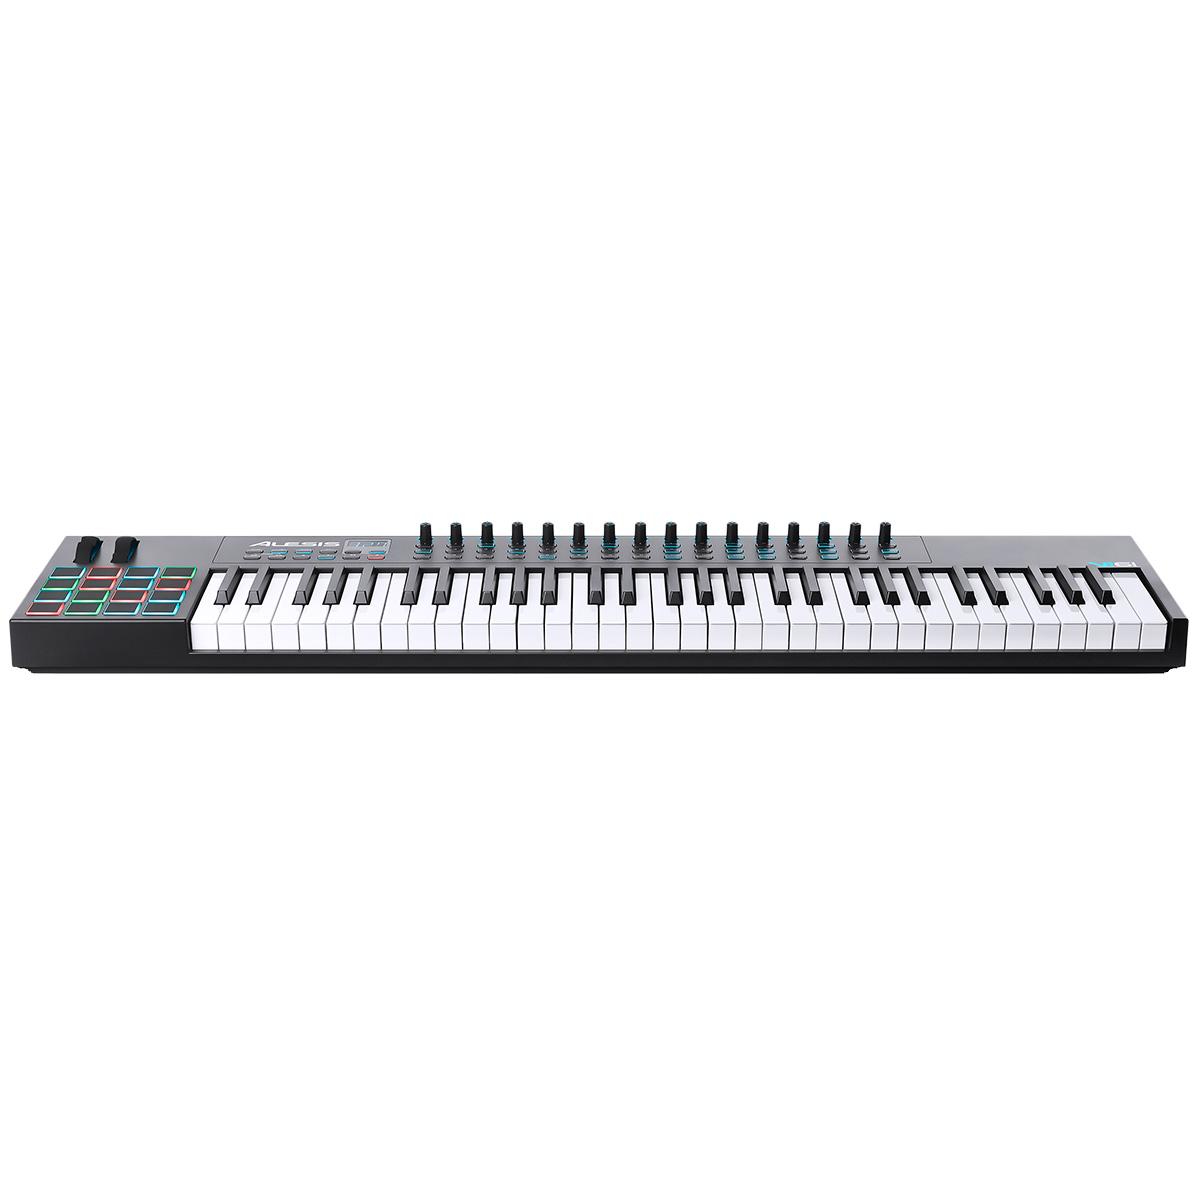 VI61 - Teclado Controlador MIDI / USB VI 61 - Alesis